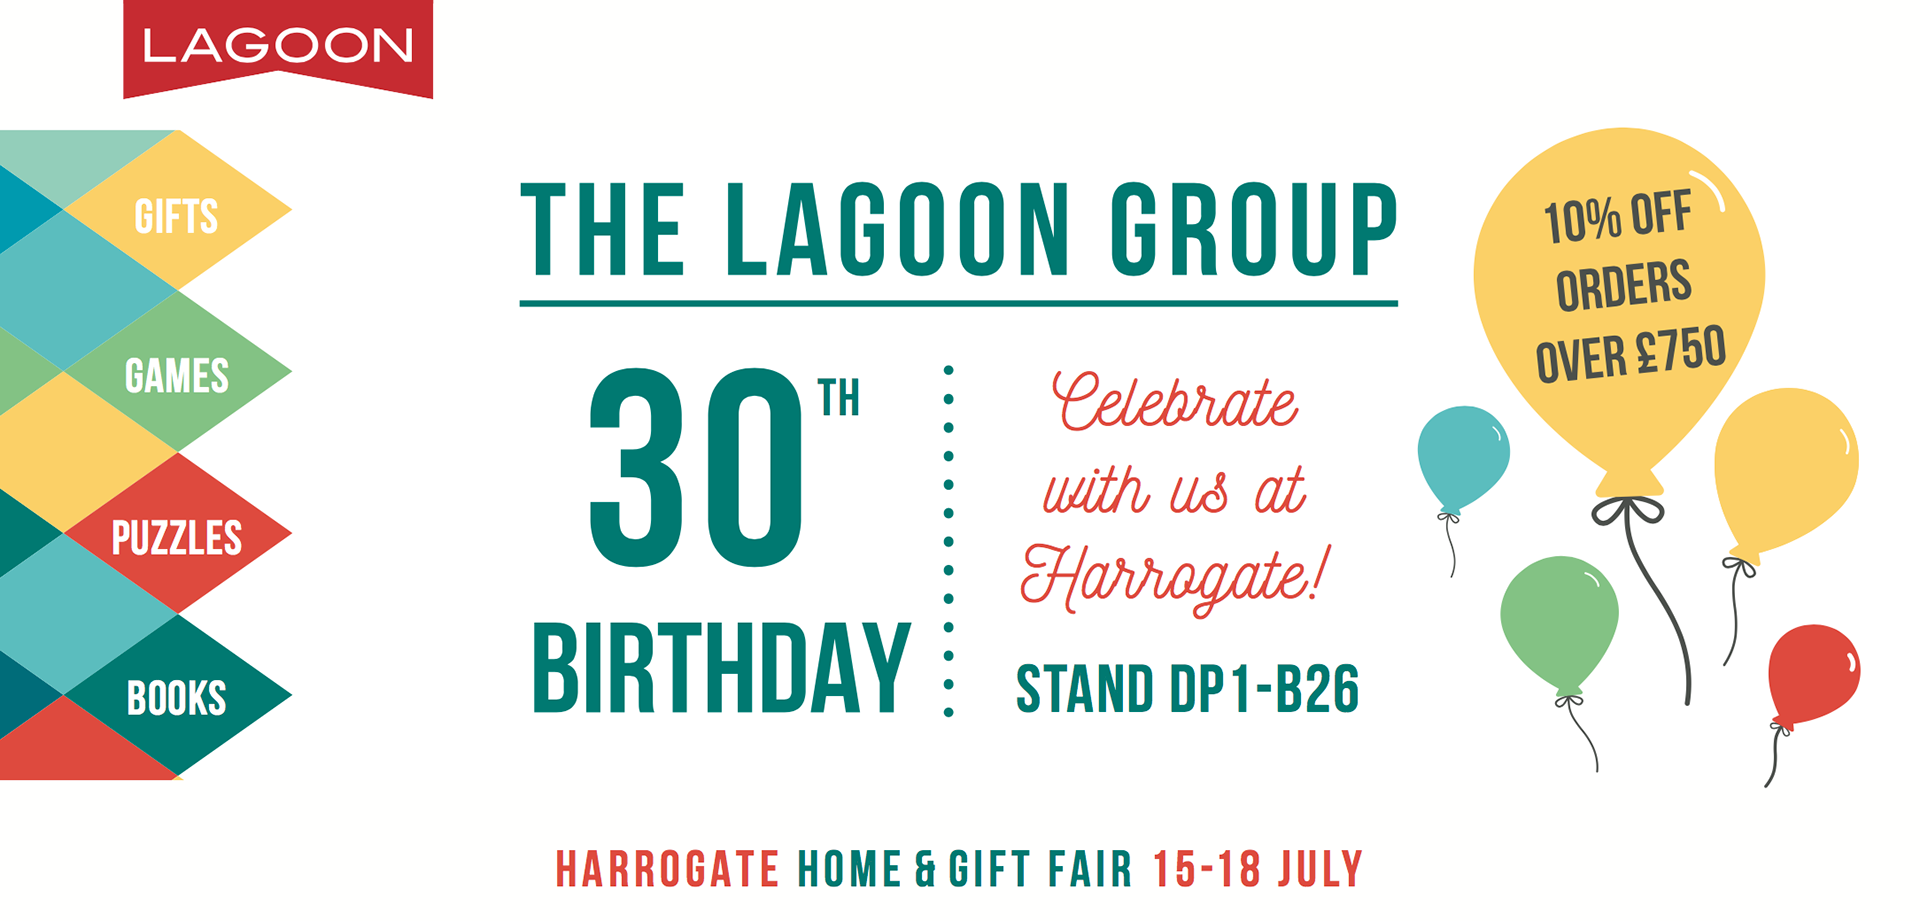 Harrogate Home and gift fair